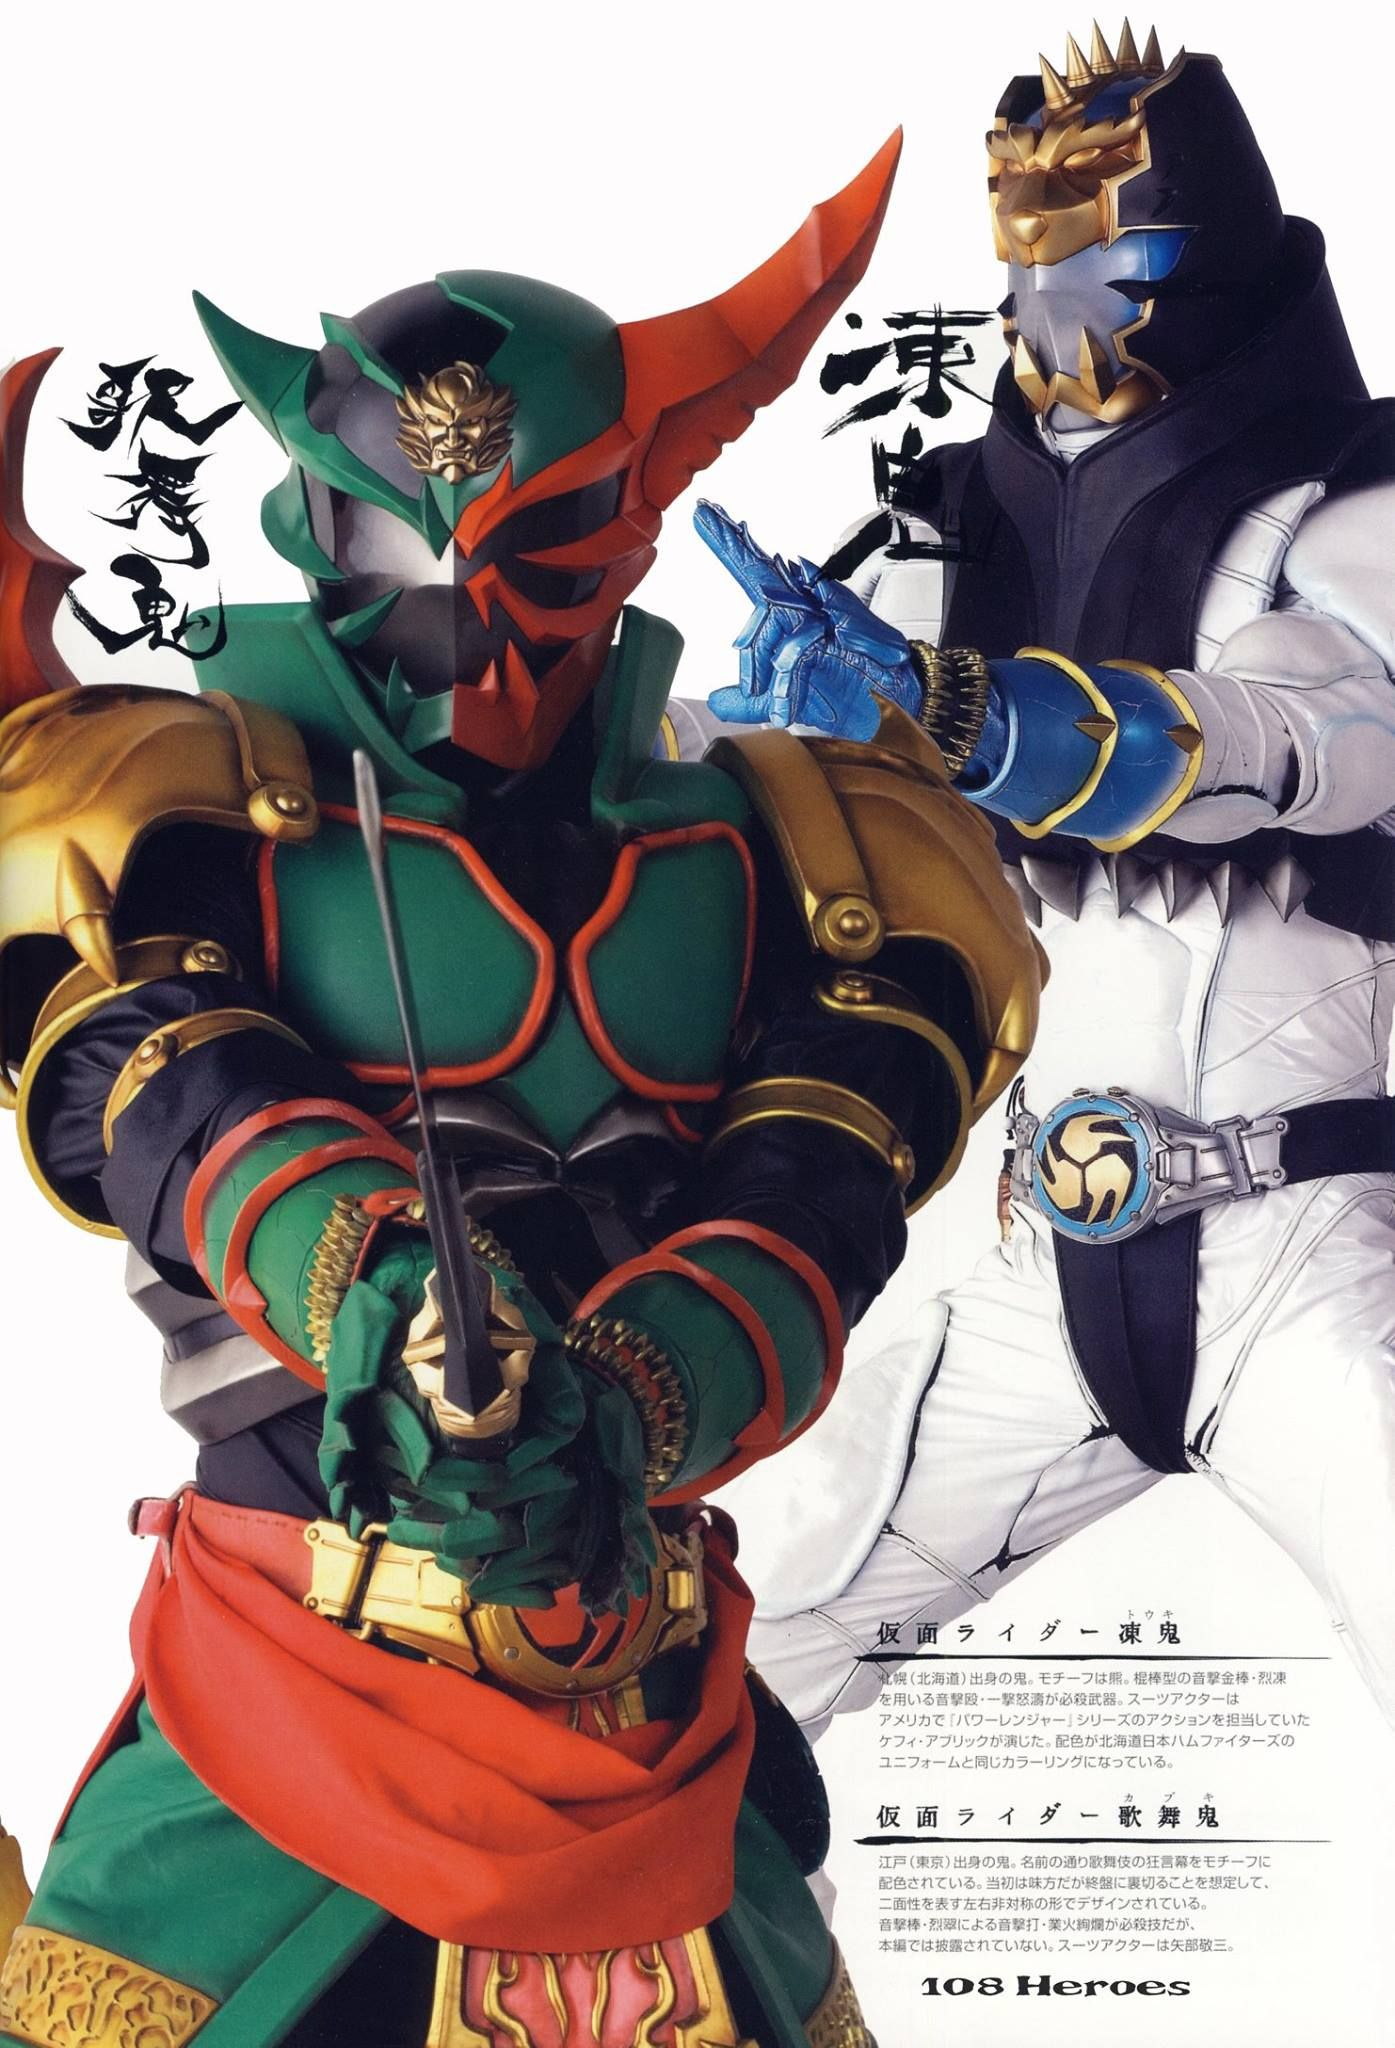 kamen rider touki おしゃれまとめの人気アイデア pinterest pat mayer スーパーヒーロー ライダー 仮面 ライダー1号